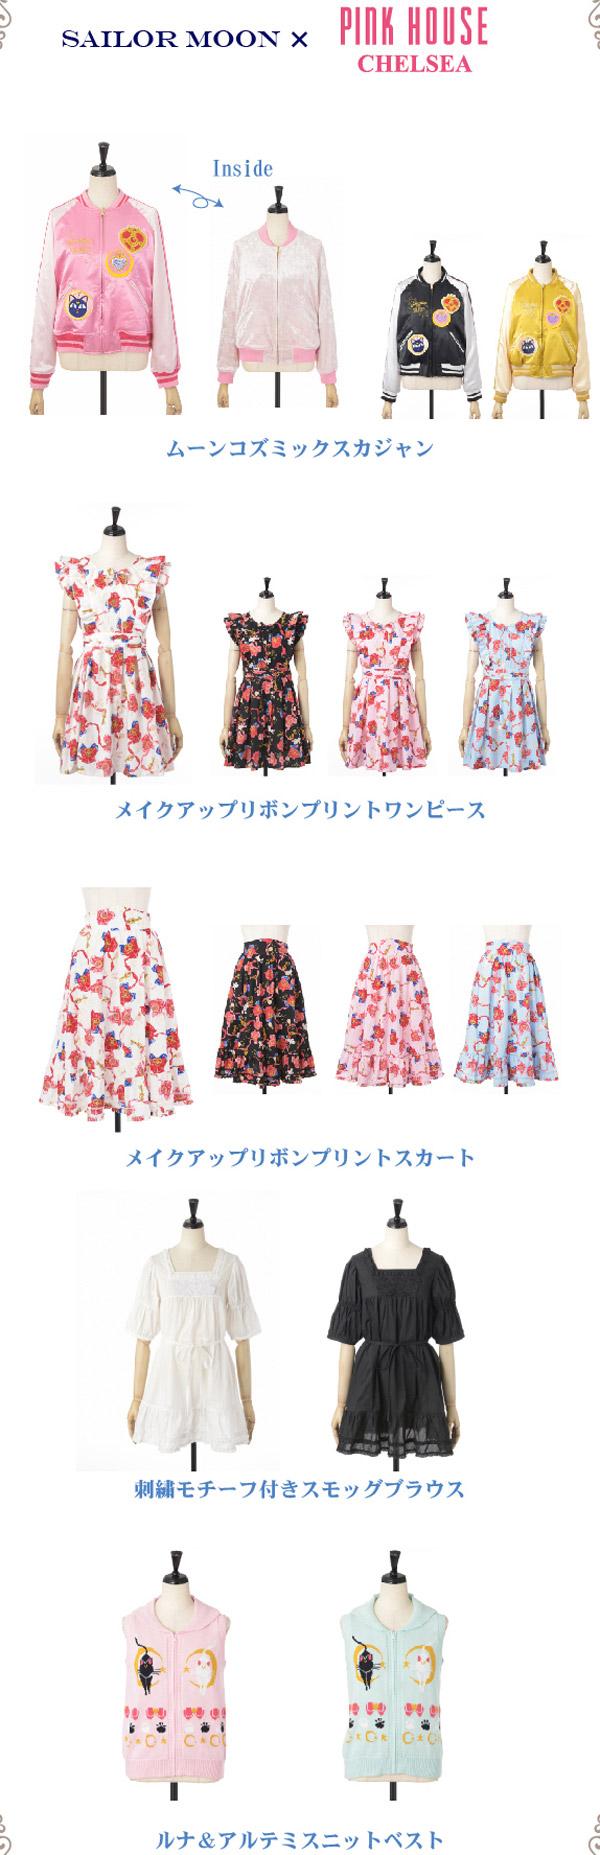 sailormoon-pink-house-chelsea-collaboration-fashion2016